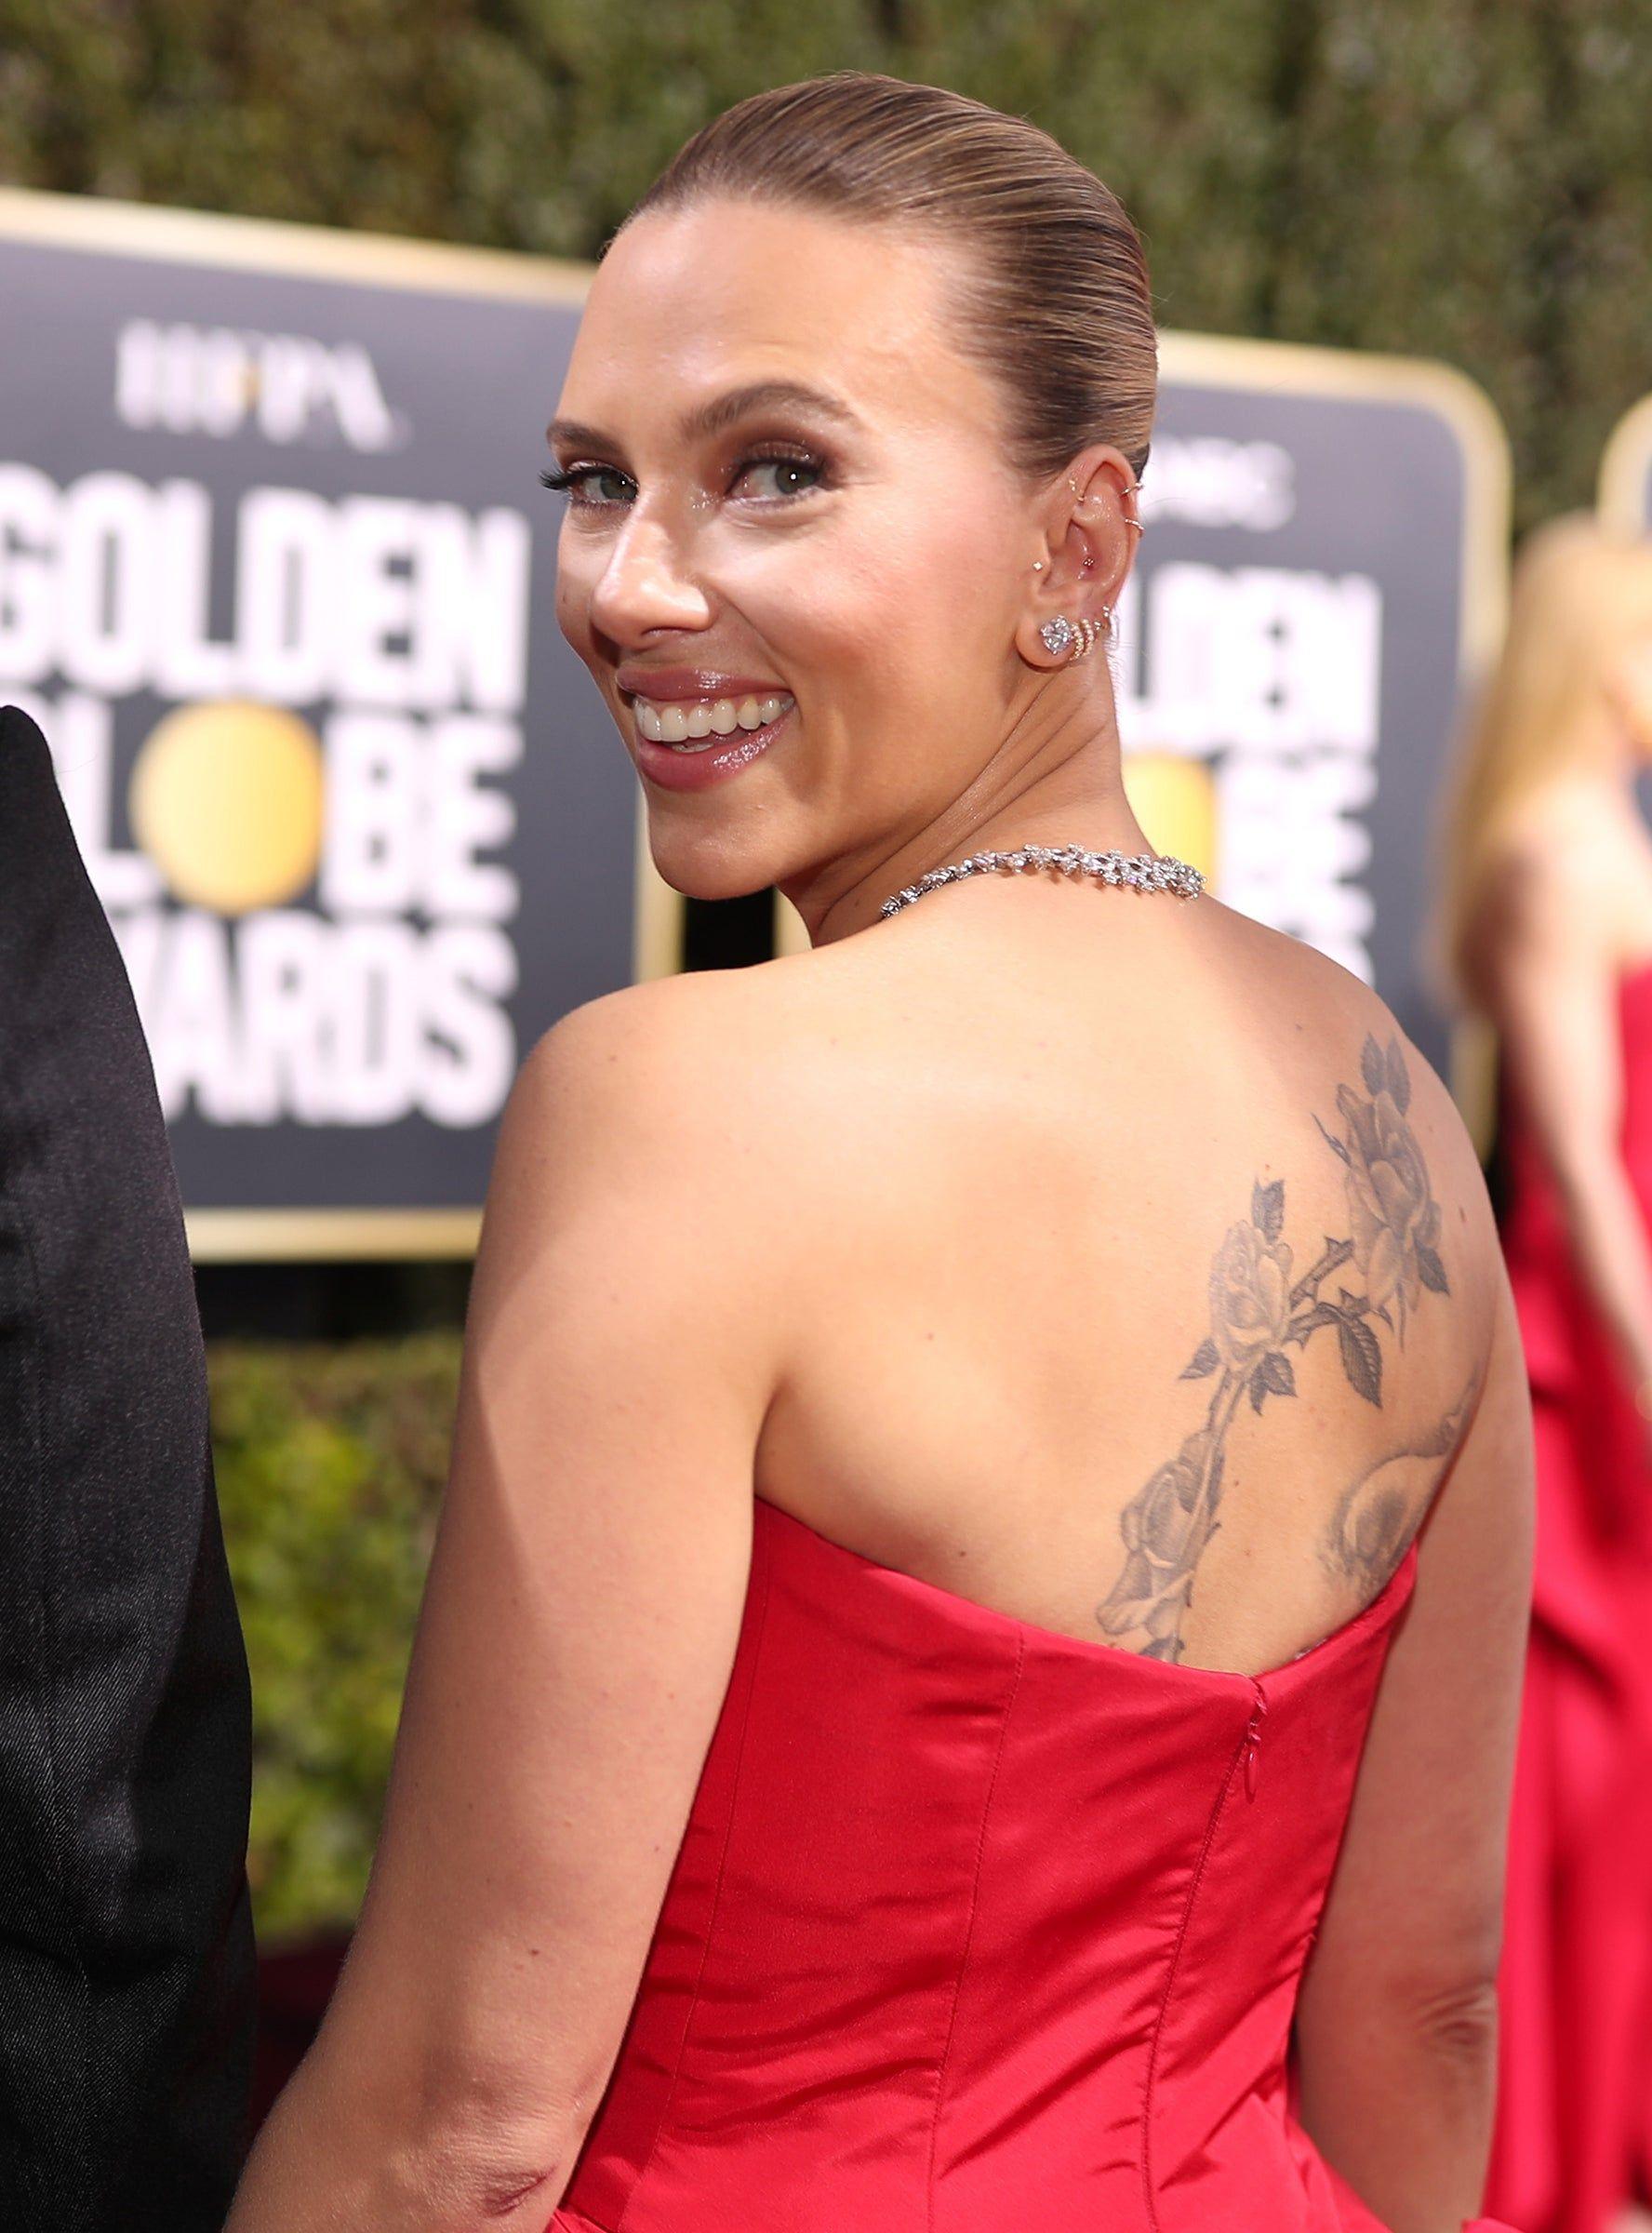 Scarlett Johansson's Golden Globes Look Puts Her Back Tattoo On ...